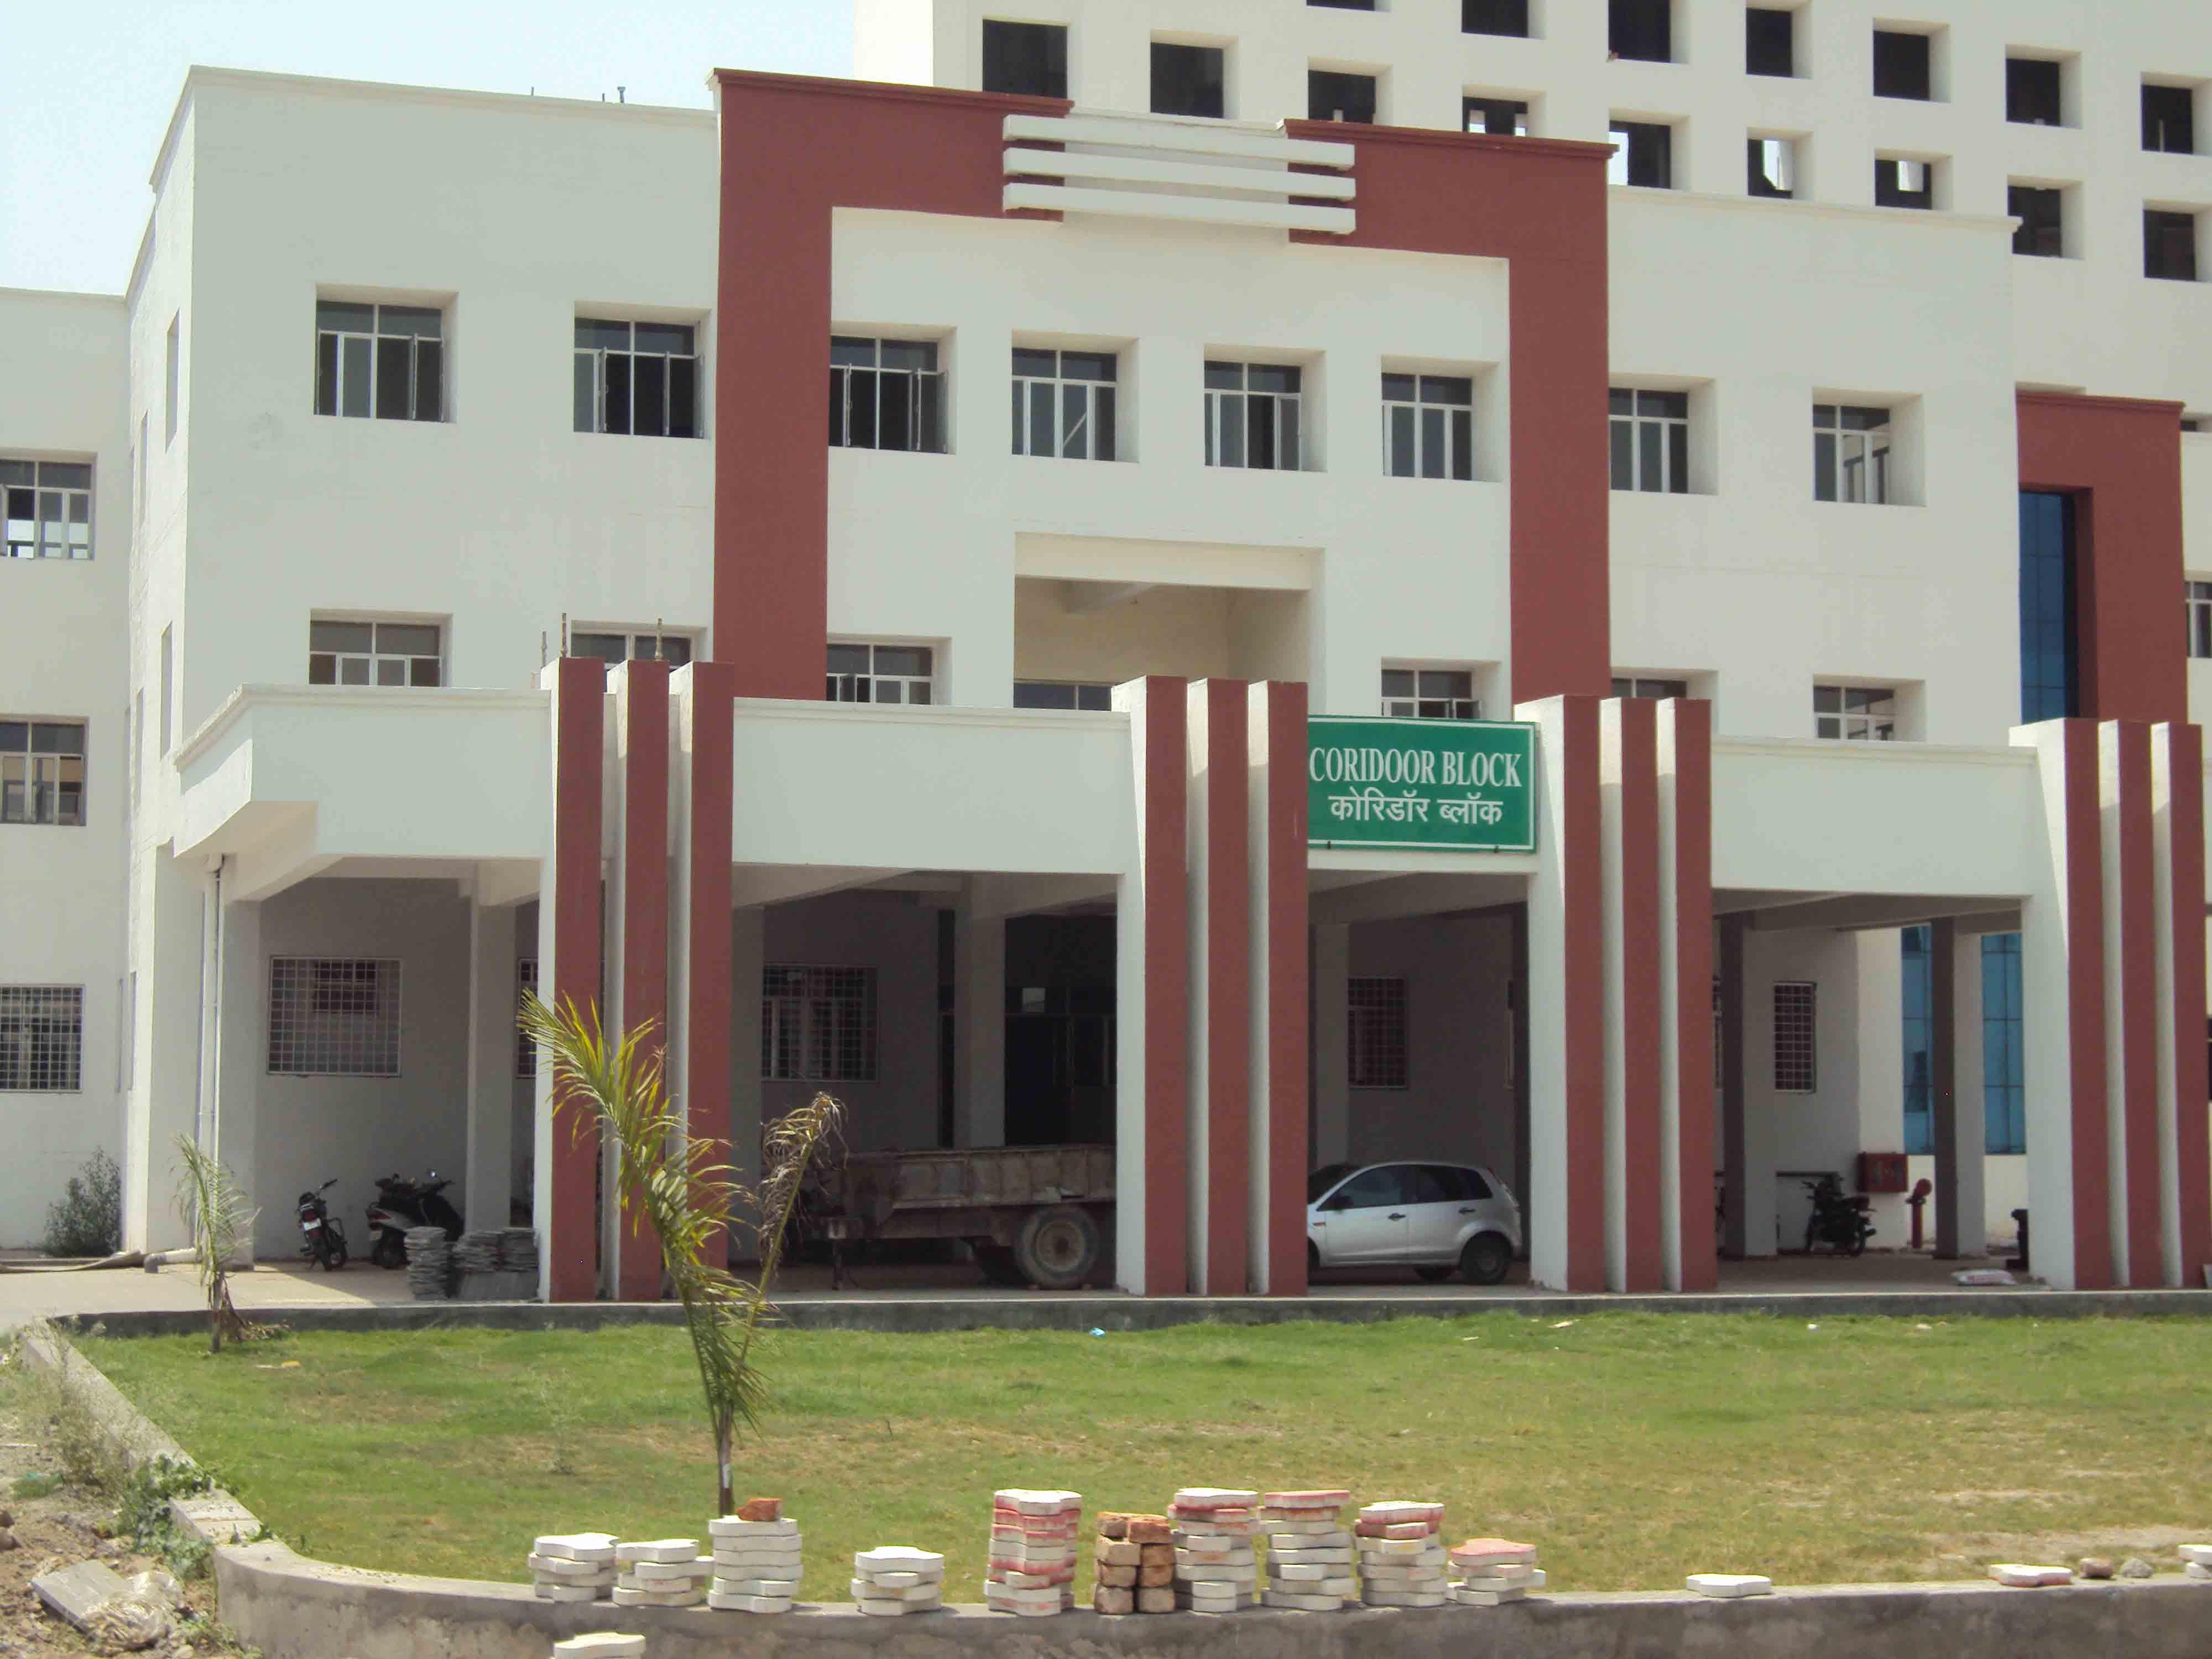 Shaikh-UL - Hind Maulana Mahmood Hasan Medical College, Saharanpur Image